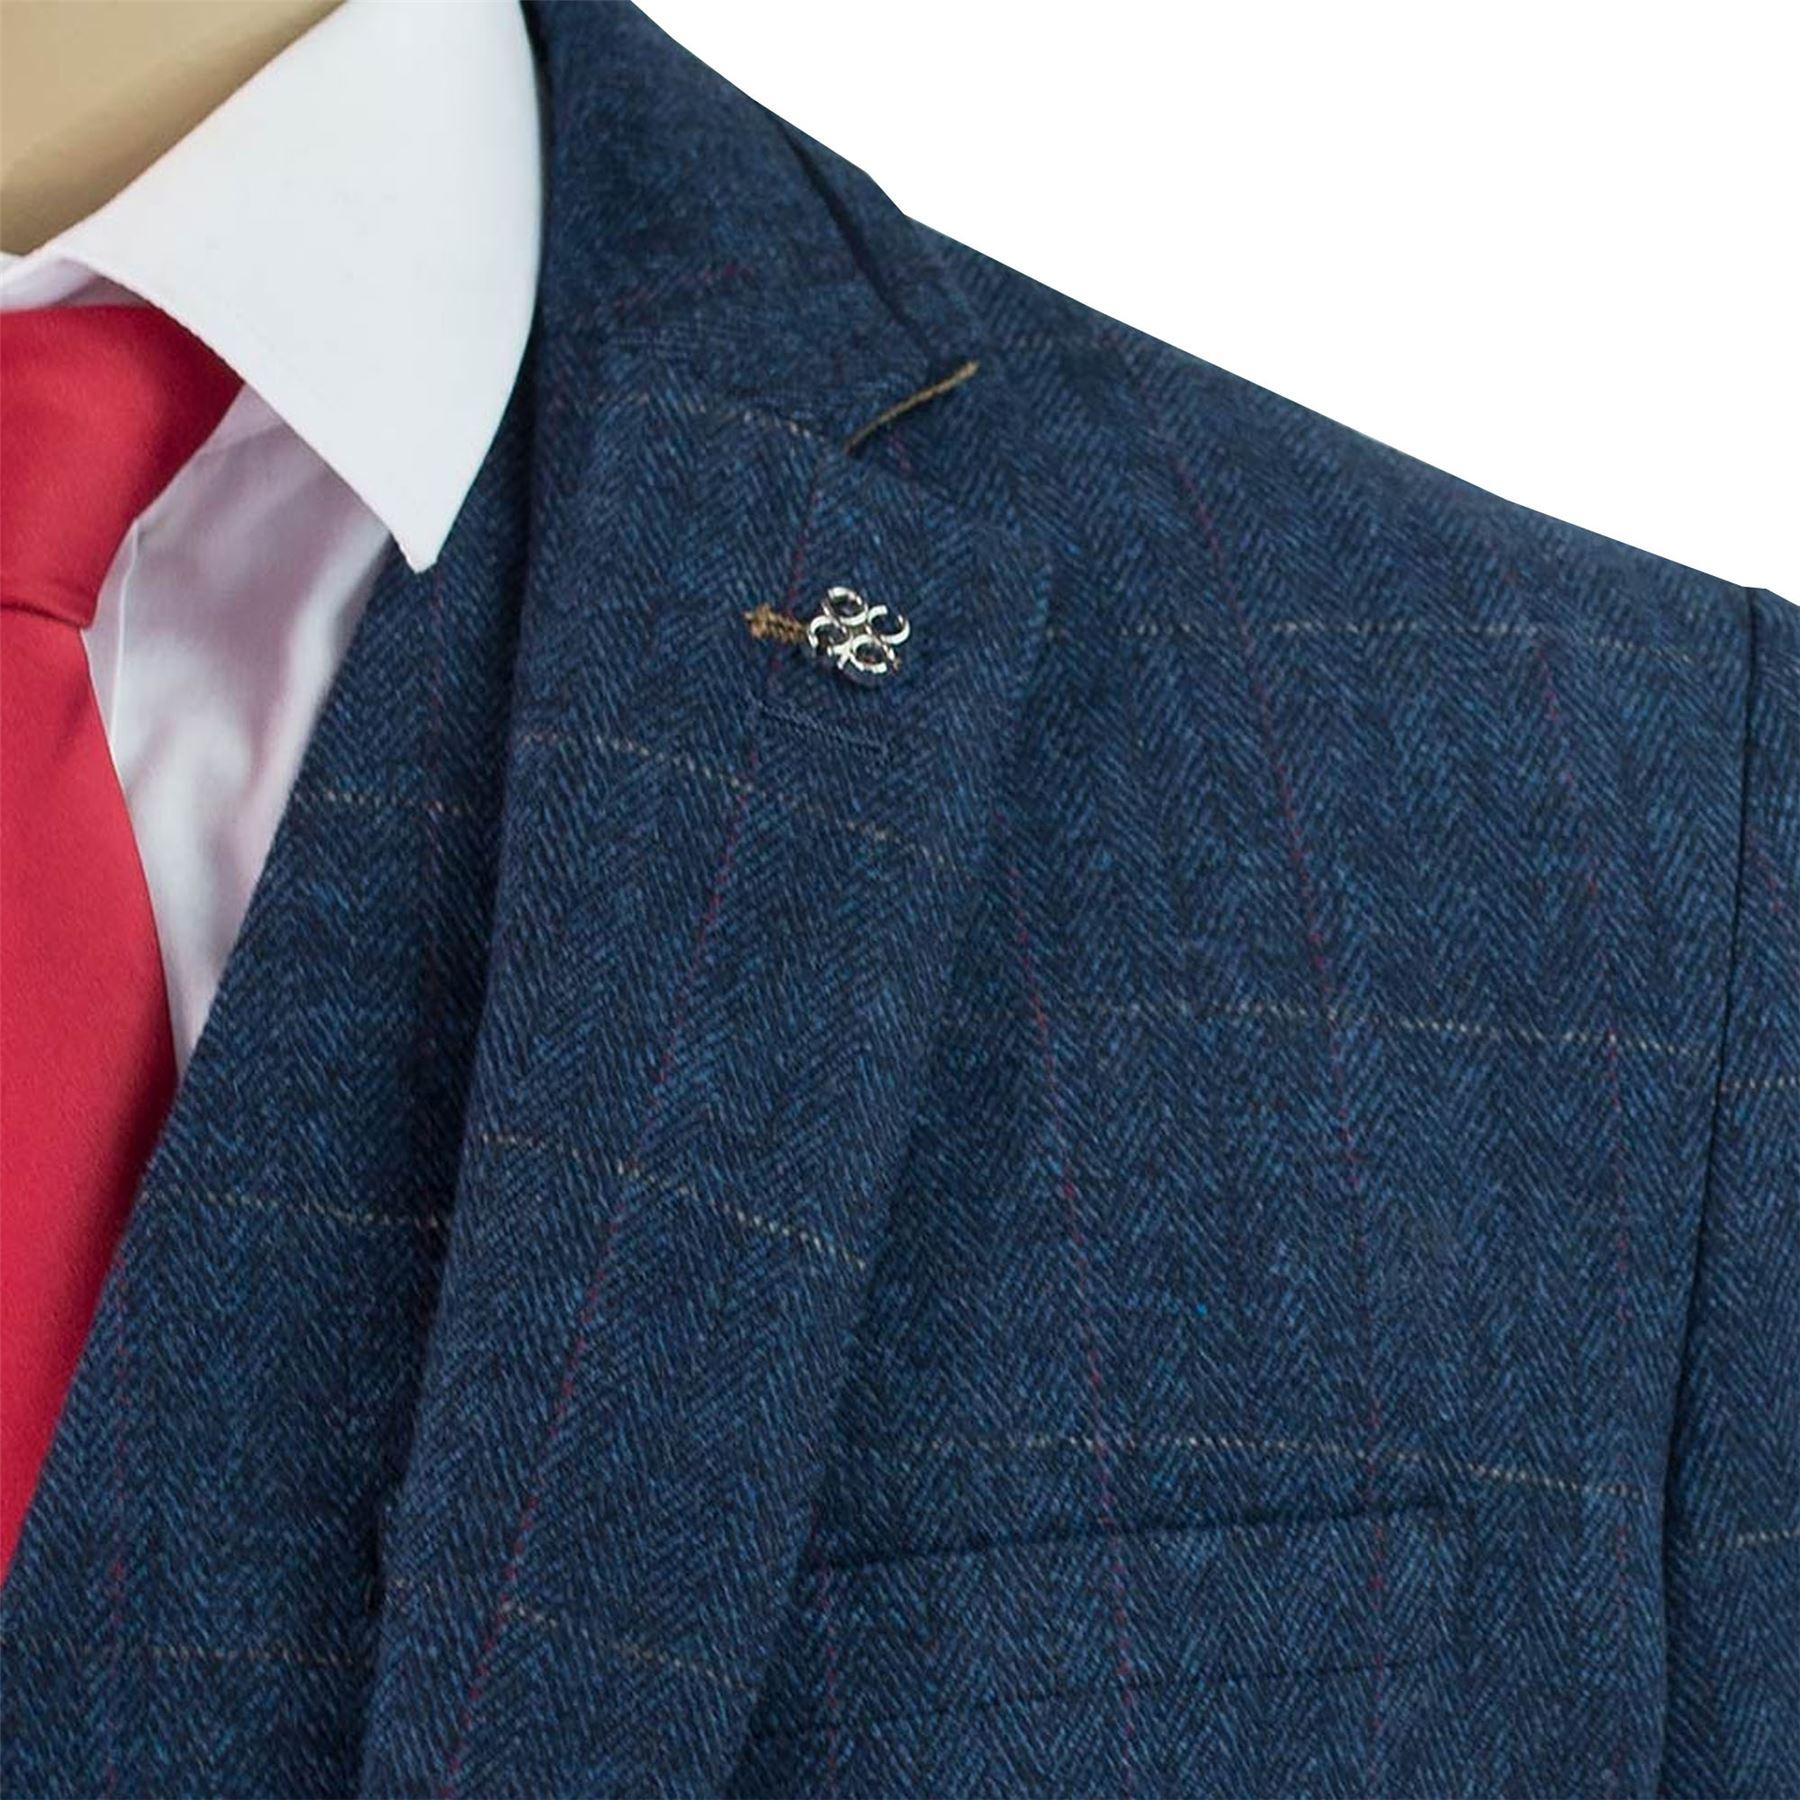 Pantaloni 3 Pantaloni Check Tweed Cavani Blu Herringbone Carnegi Uomo Blazer pezzi Wasitcoat zrxwUz